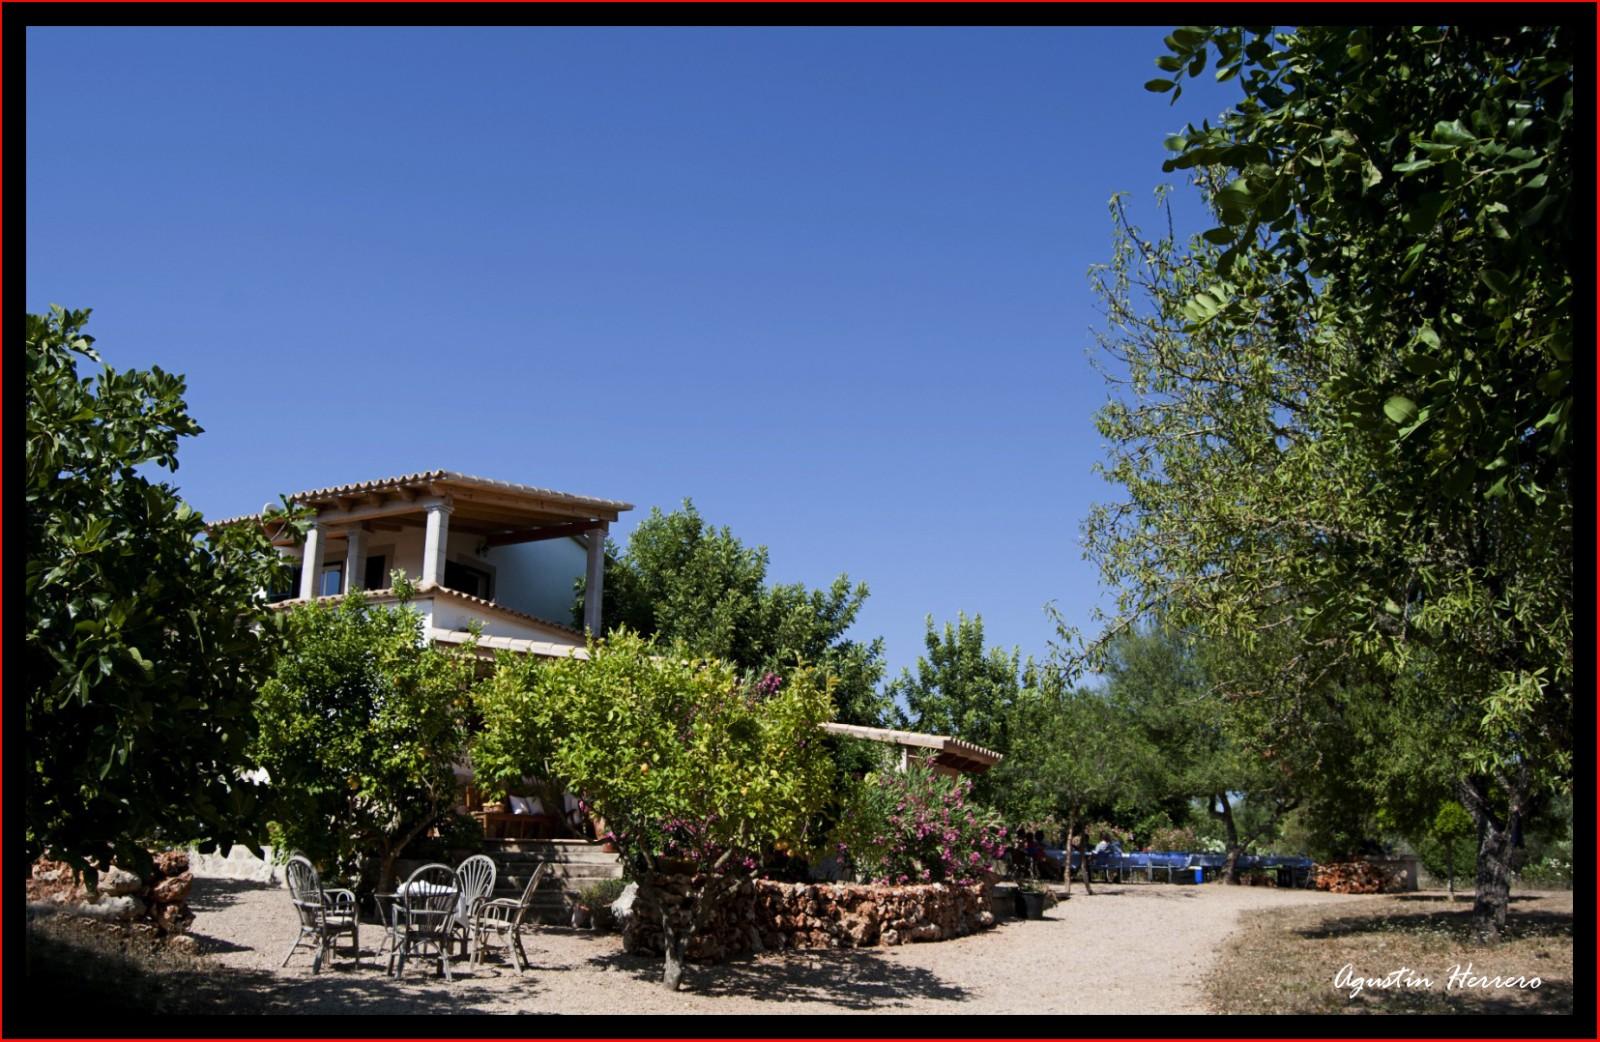 2011-07-17-ludwic-house-58